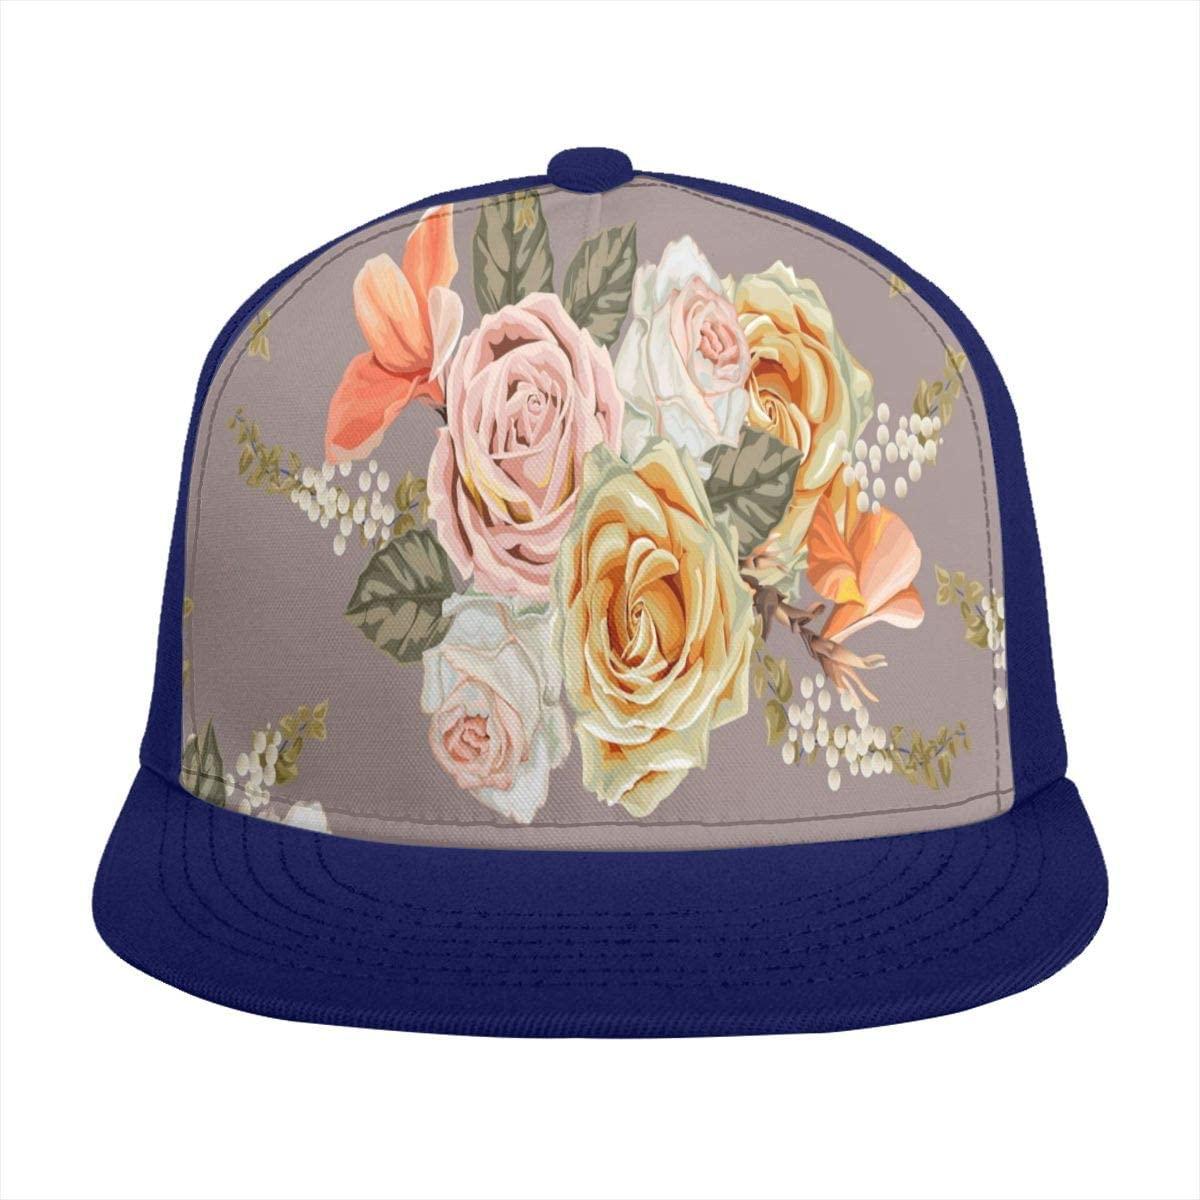 Baseball Cap Retro Rose Flower Floral Brown Sun Visor Flat Brim Hats Cap for Women Men Summer